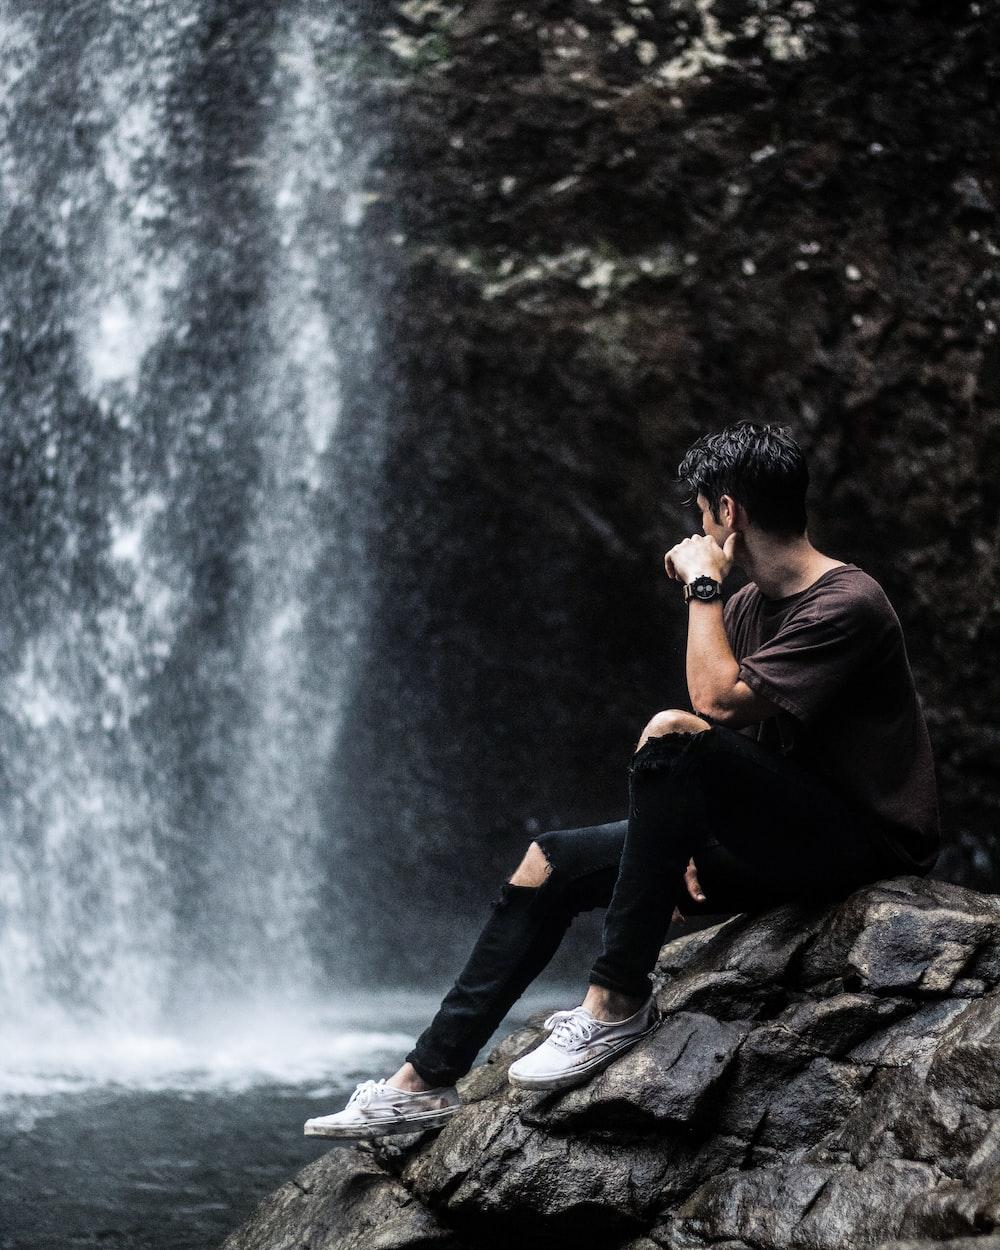 man sitting near waterfalls